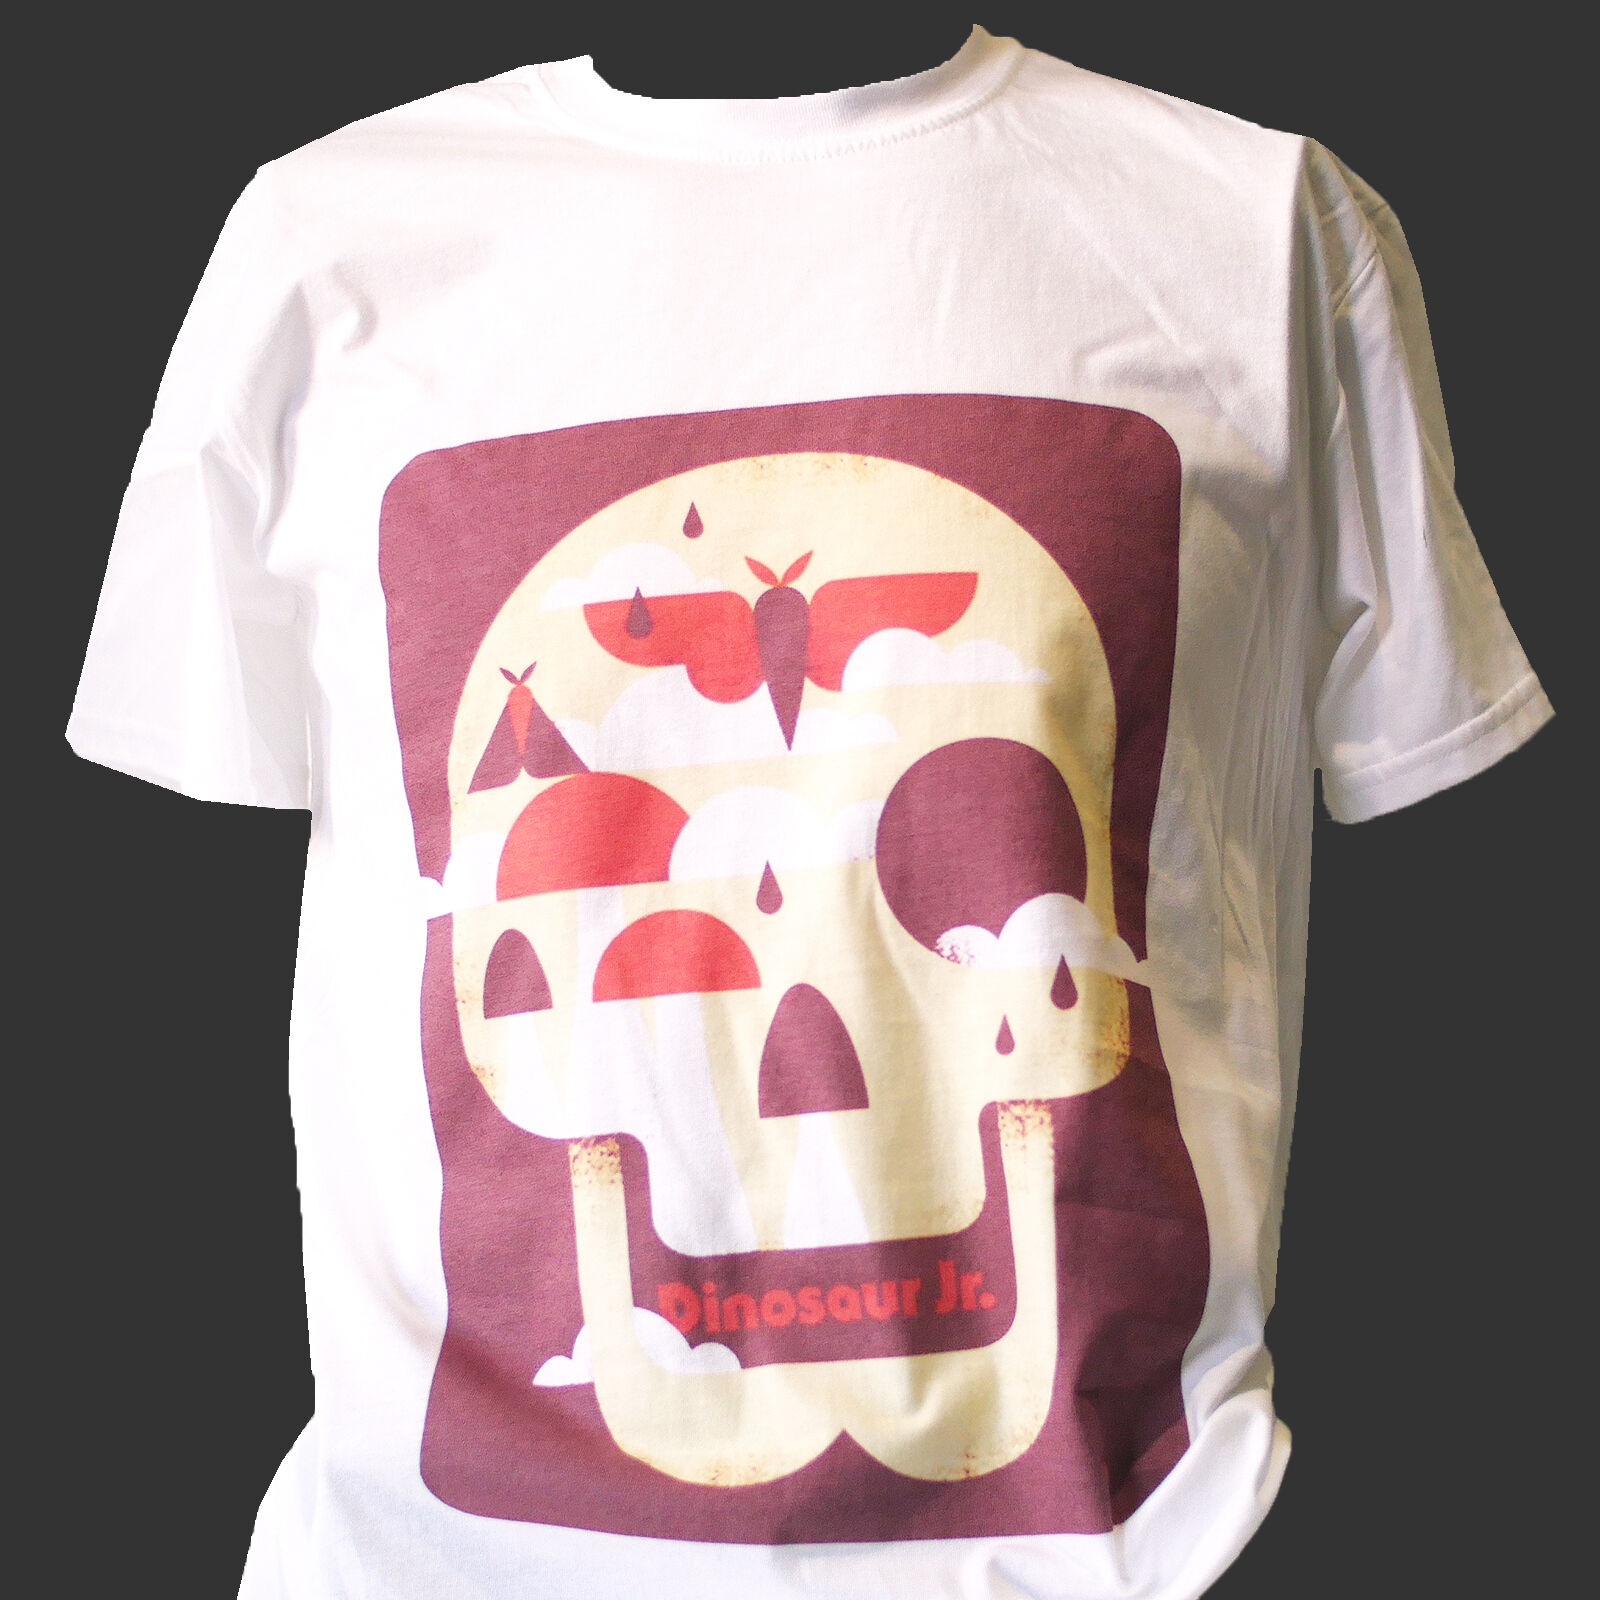 Dinosuar Jr. Punk Rock Metal T-shirt Sonic Youth PIXIES PIXIES PIXIES S M L XL 2XL 3XL 7c6118